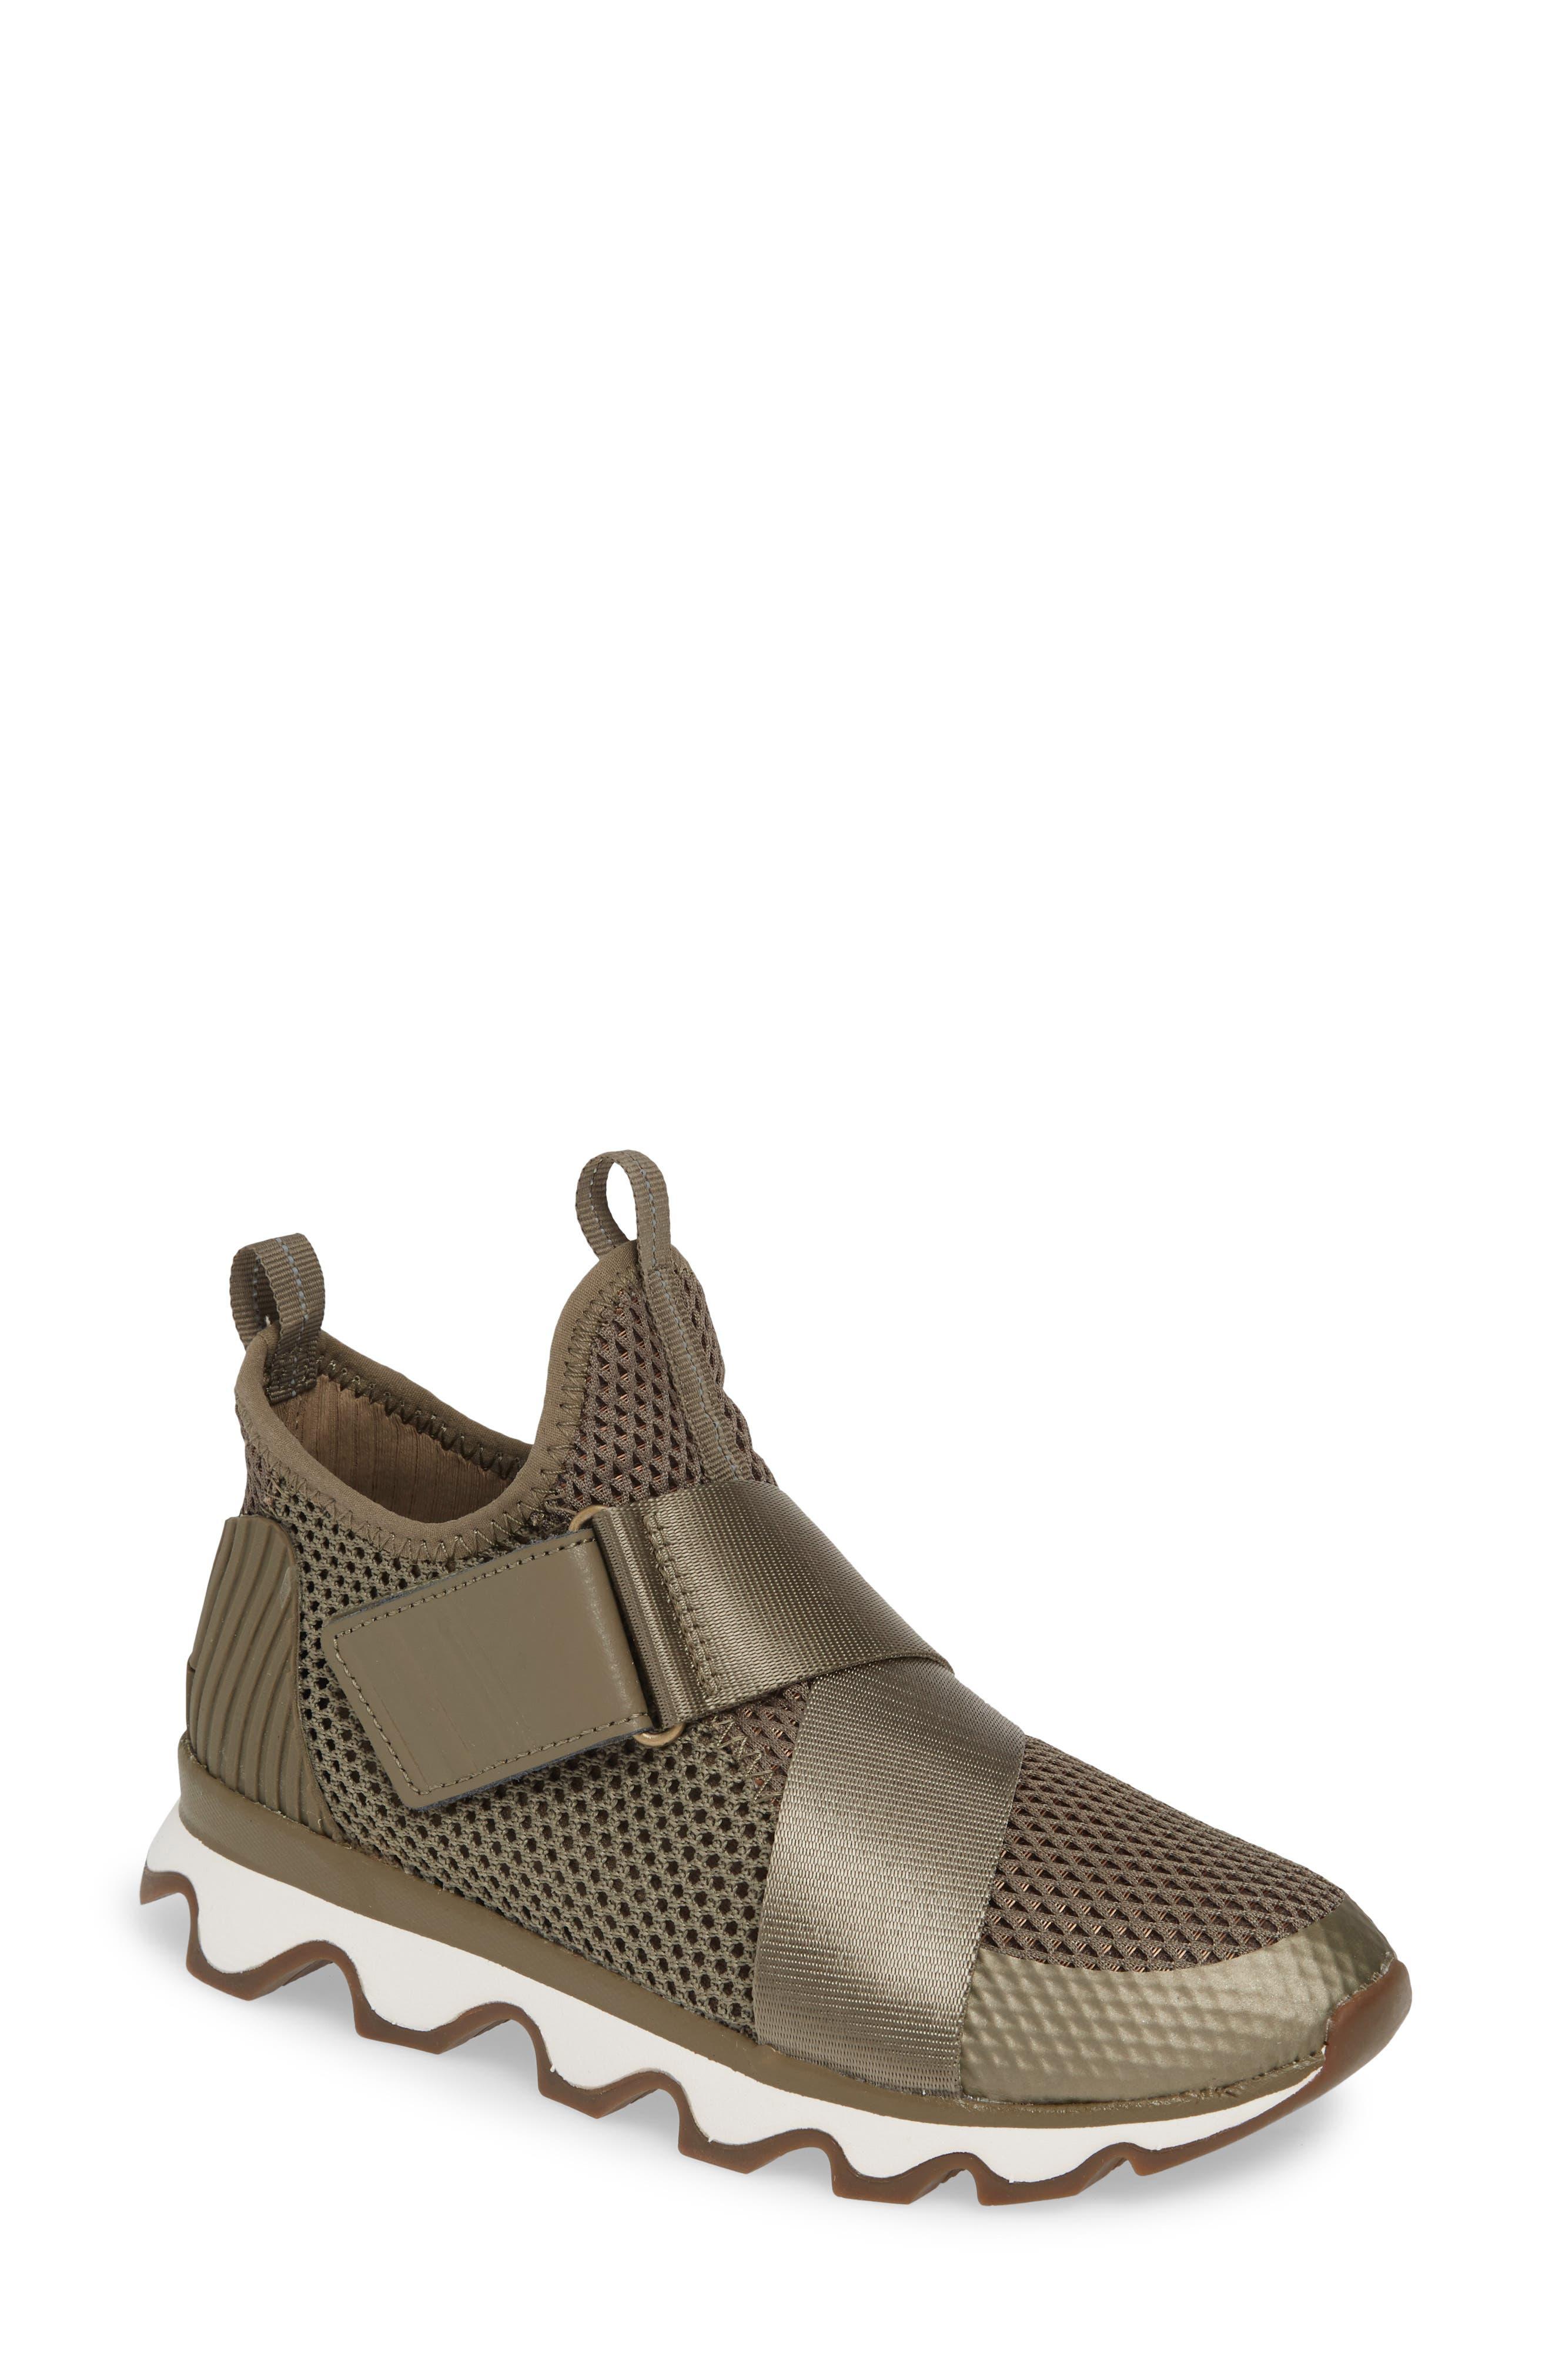 Sorel Kinetic Sneak High Top Sneaker, Green